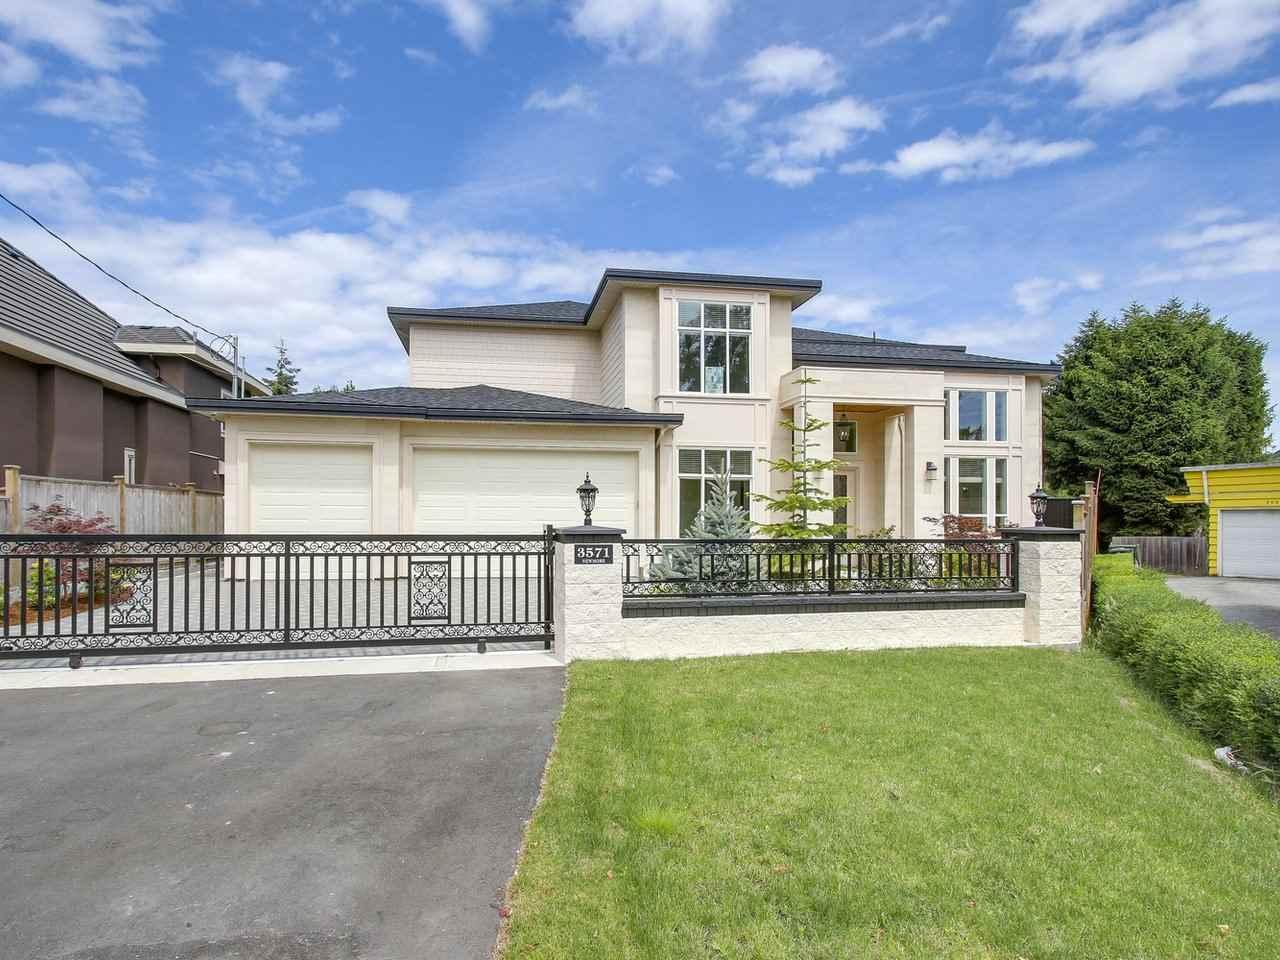 Detached at 3571 NEWMORE AVENUE, Richmond, British Columbia. Image 1